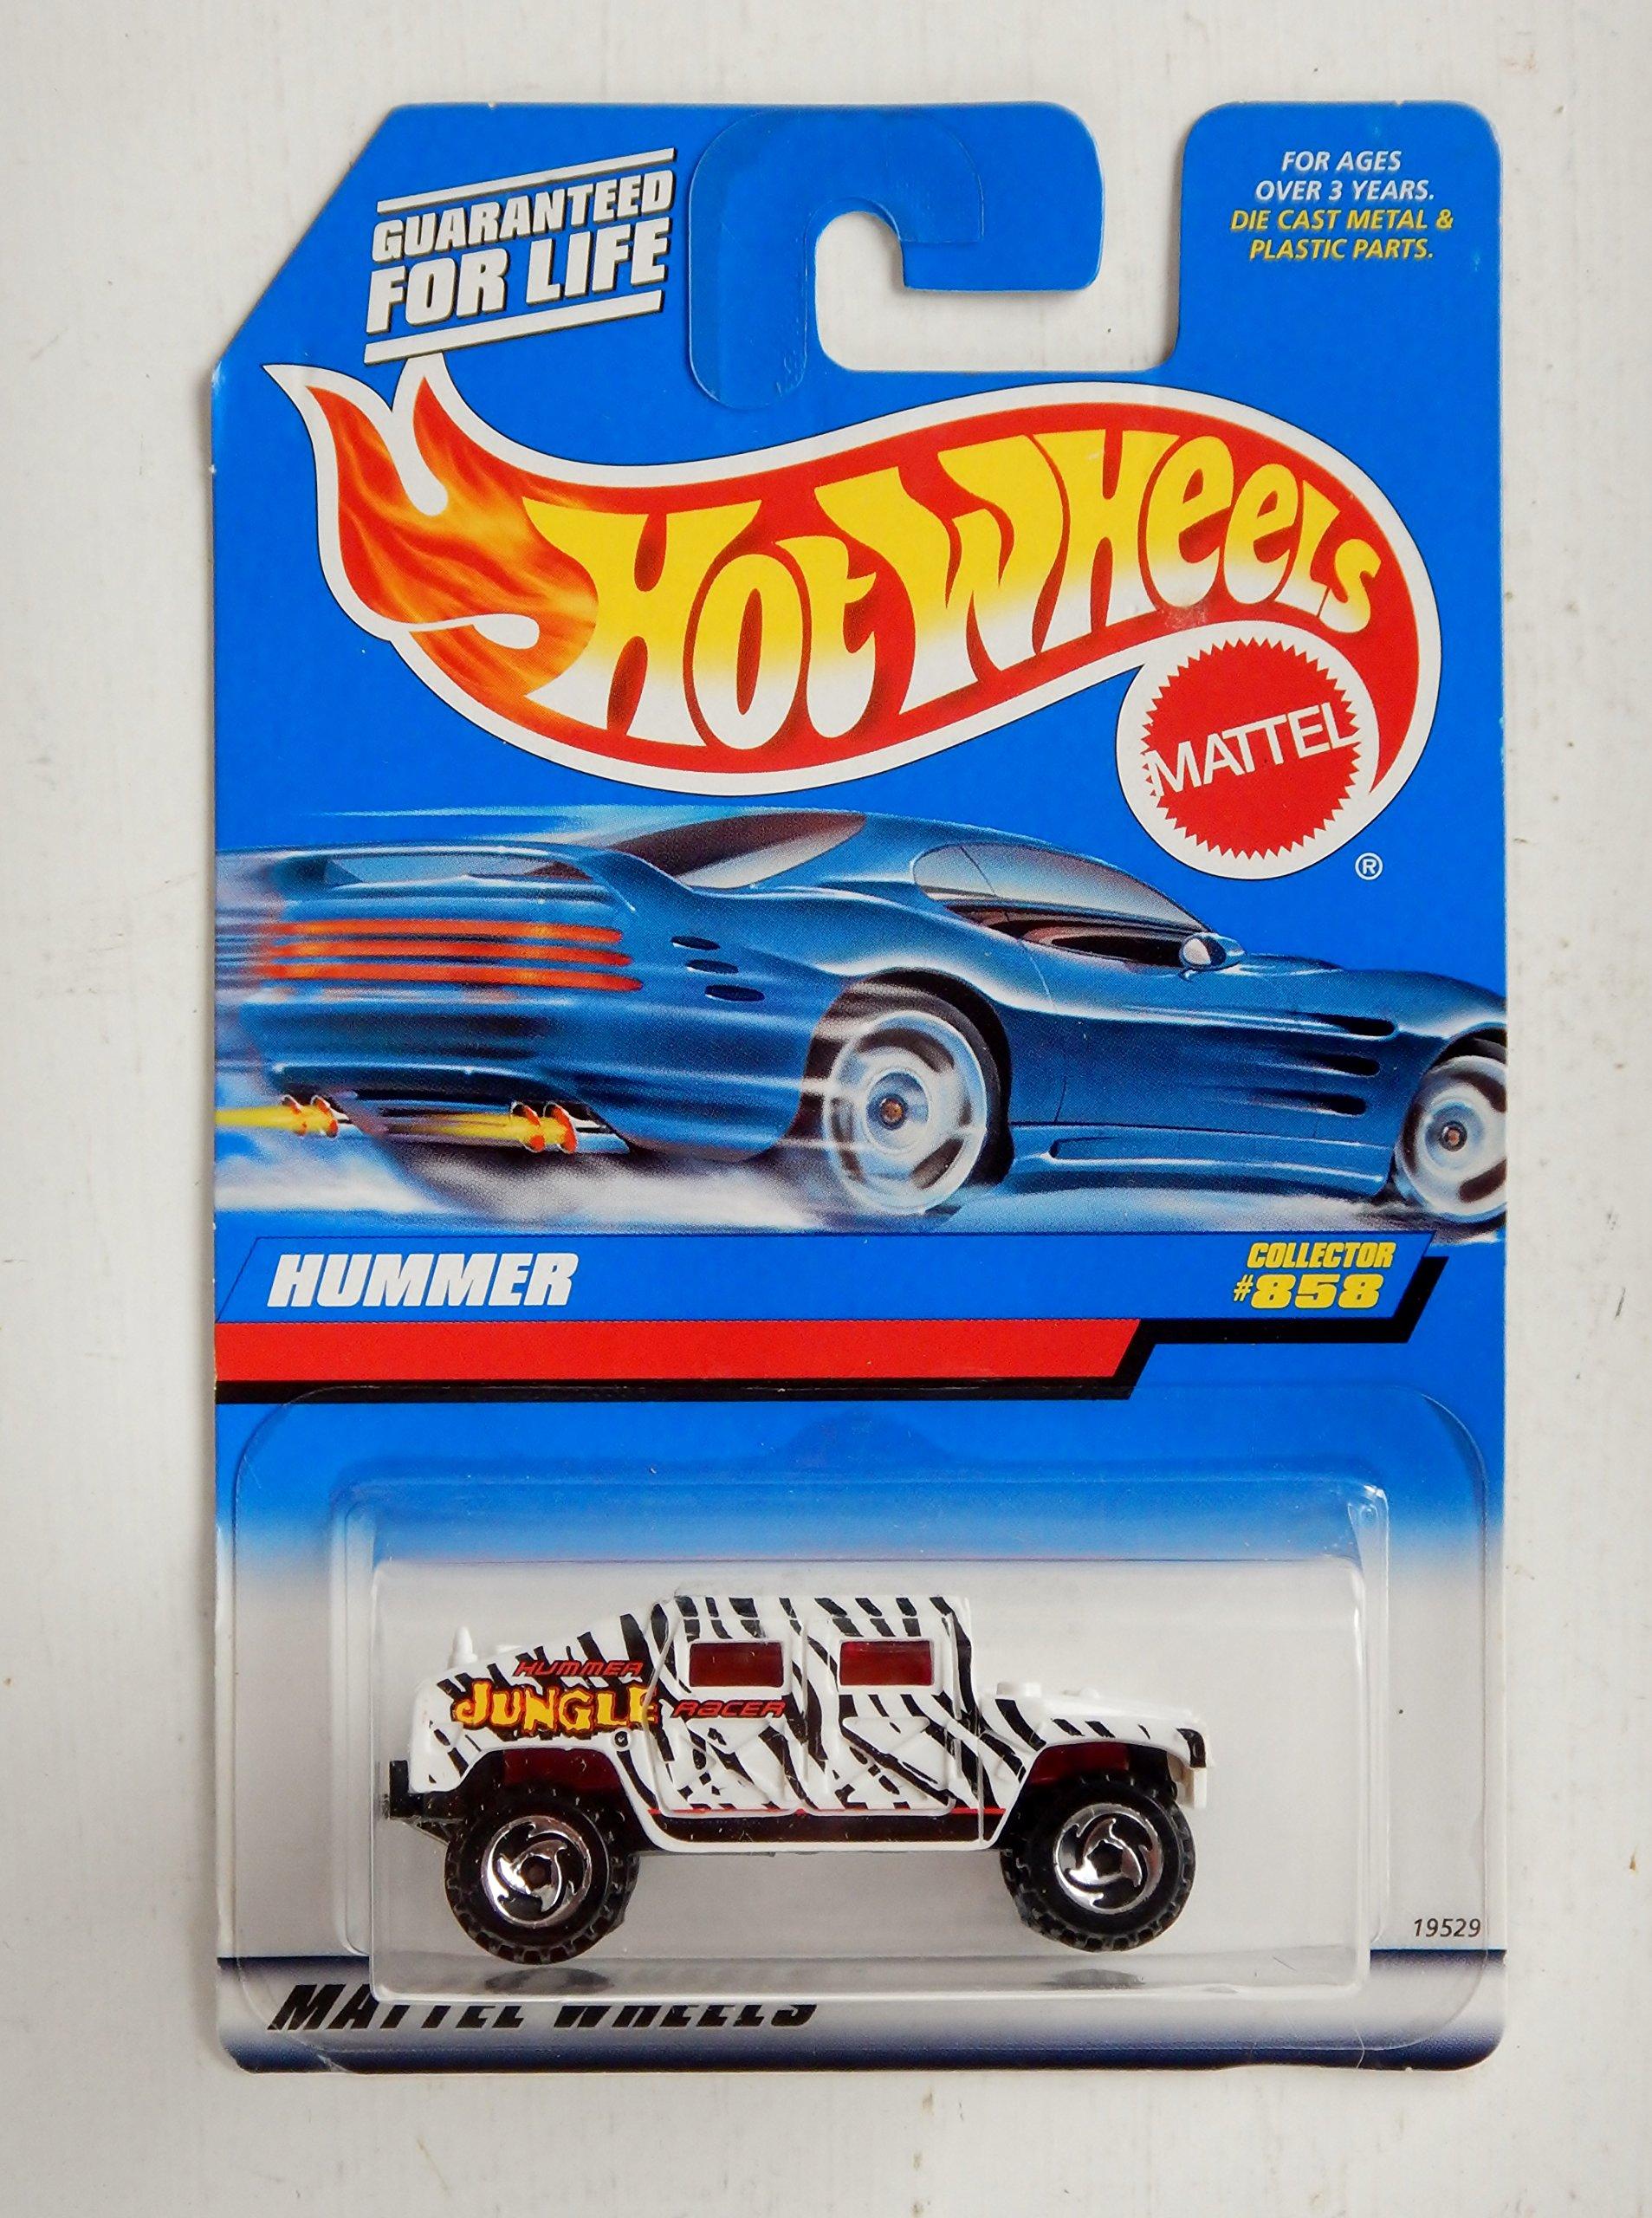 Mattel Hot Wheels 1998 1:64 Scale White & Black Hummer Die Cast Truck Collector #858